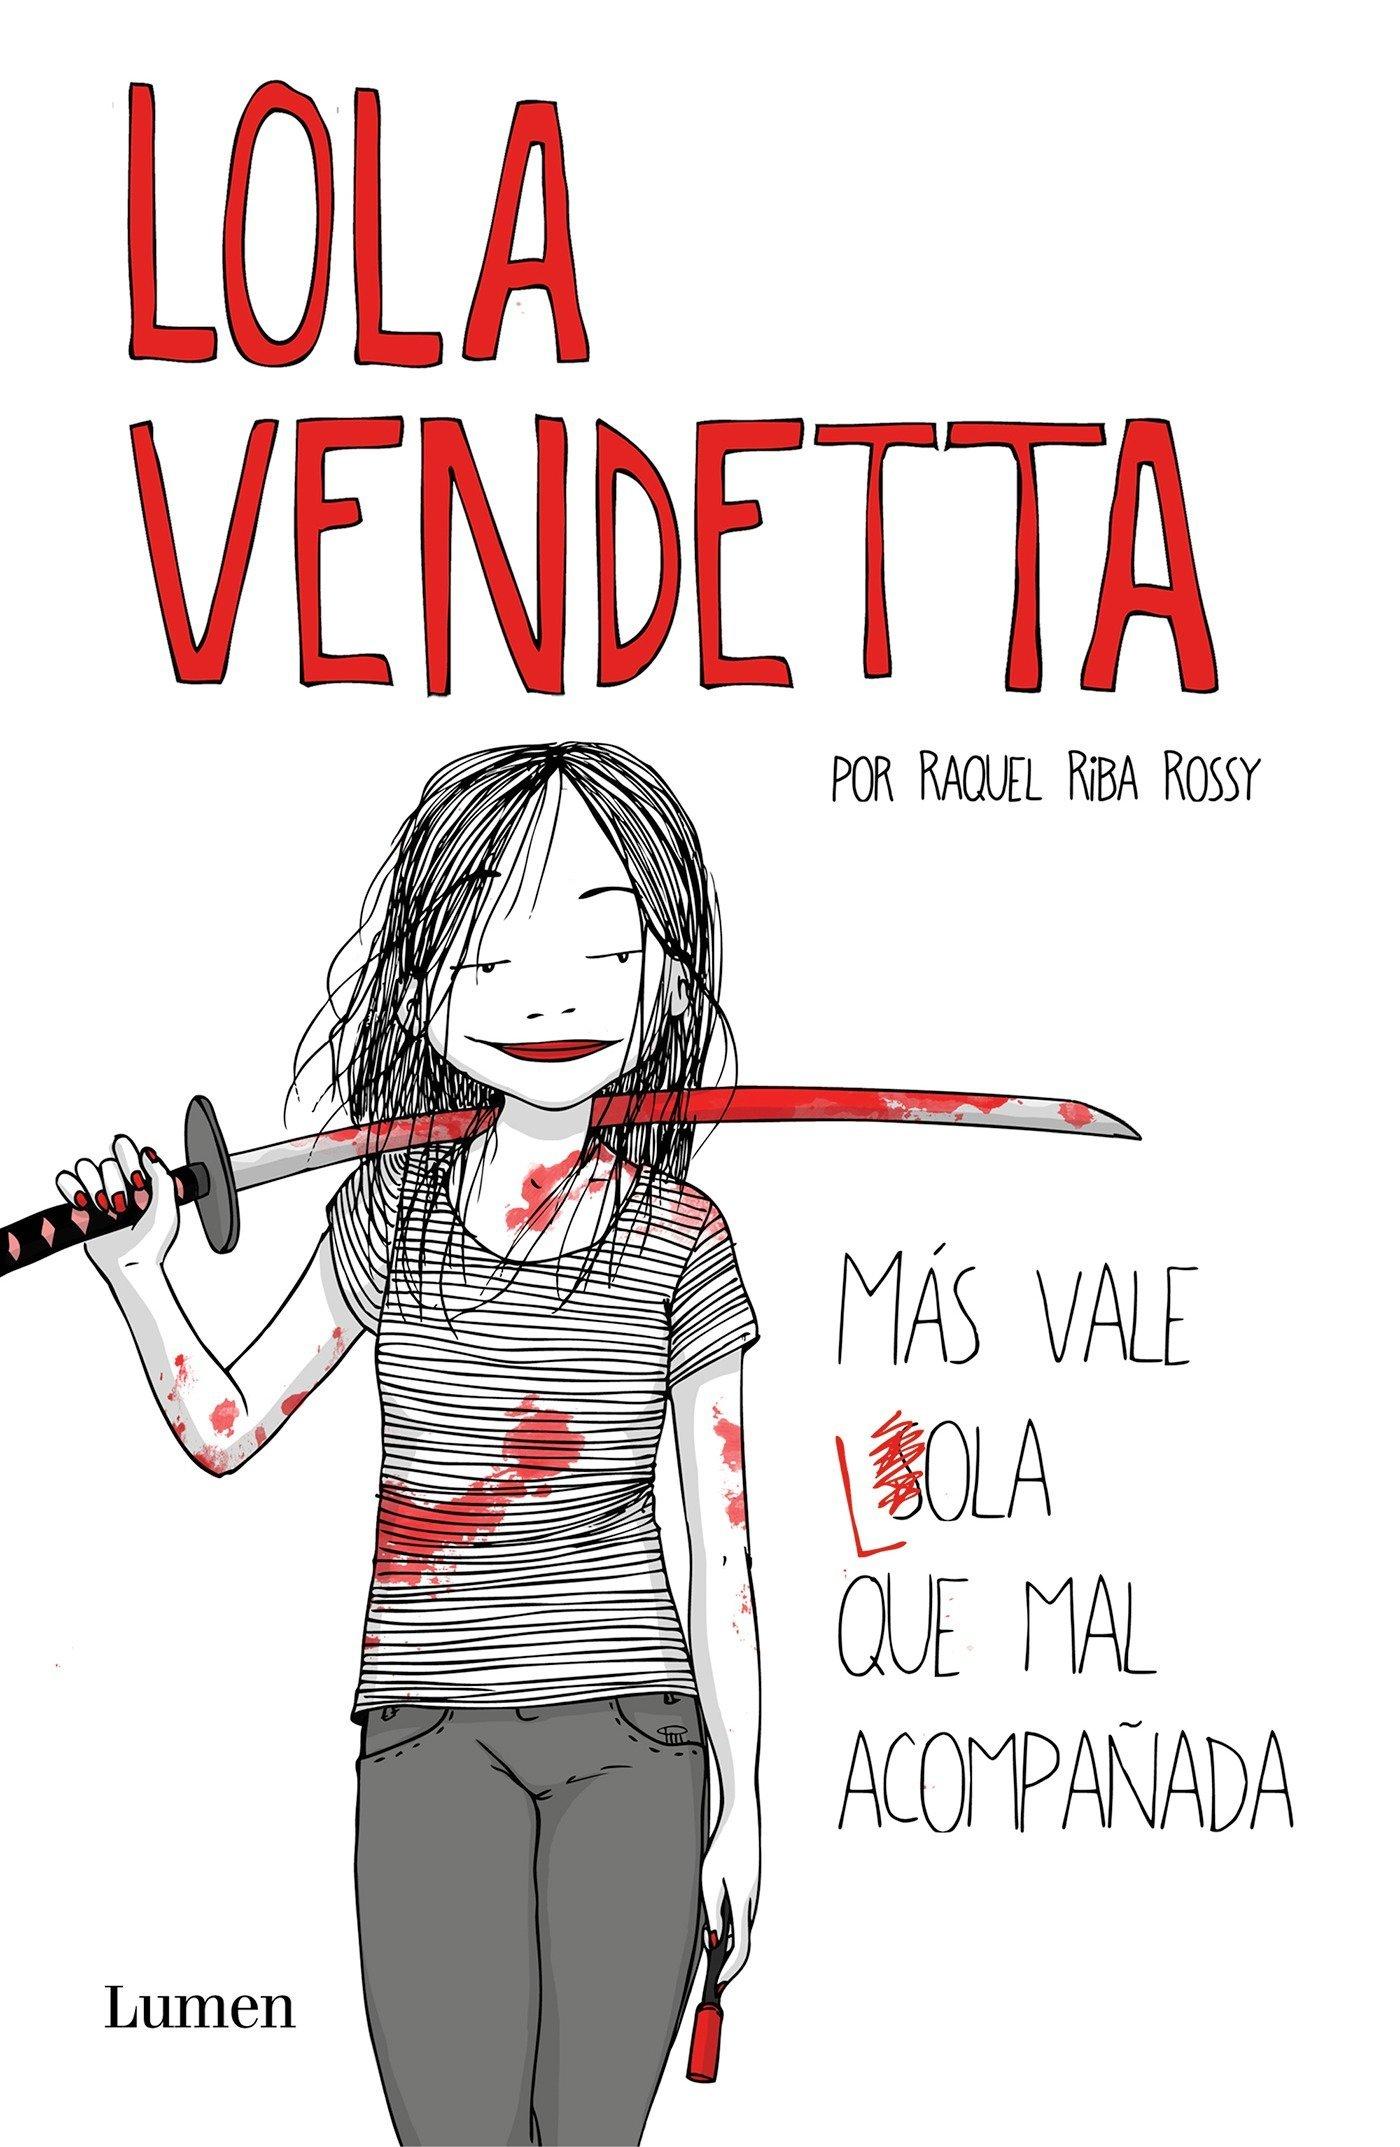 Lola Vendetta (Spanish Edition): Más vale Lola que mal acompañada (LUMEN GRÁFICA, Band 19136)